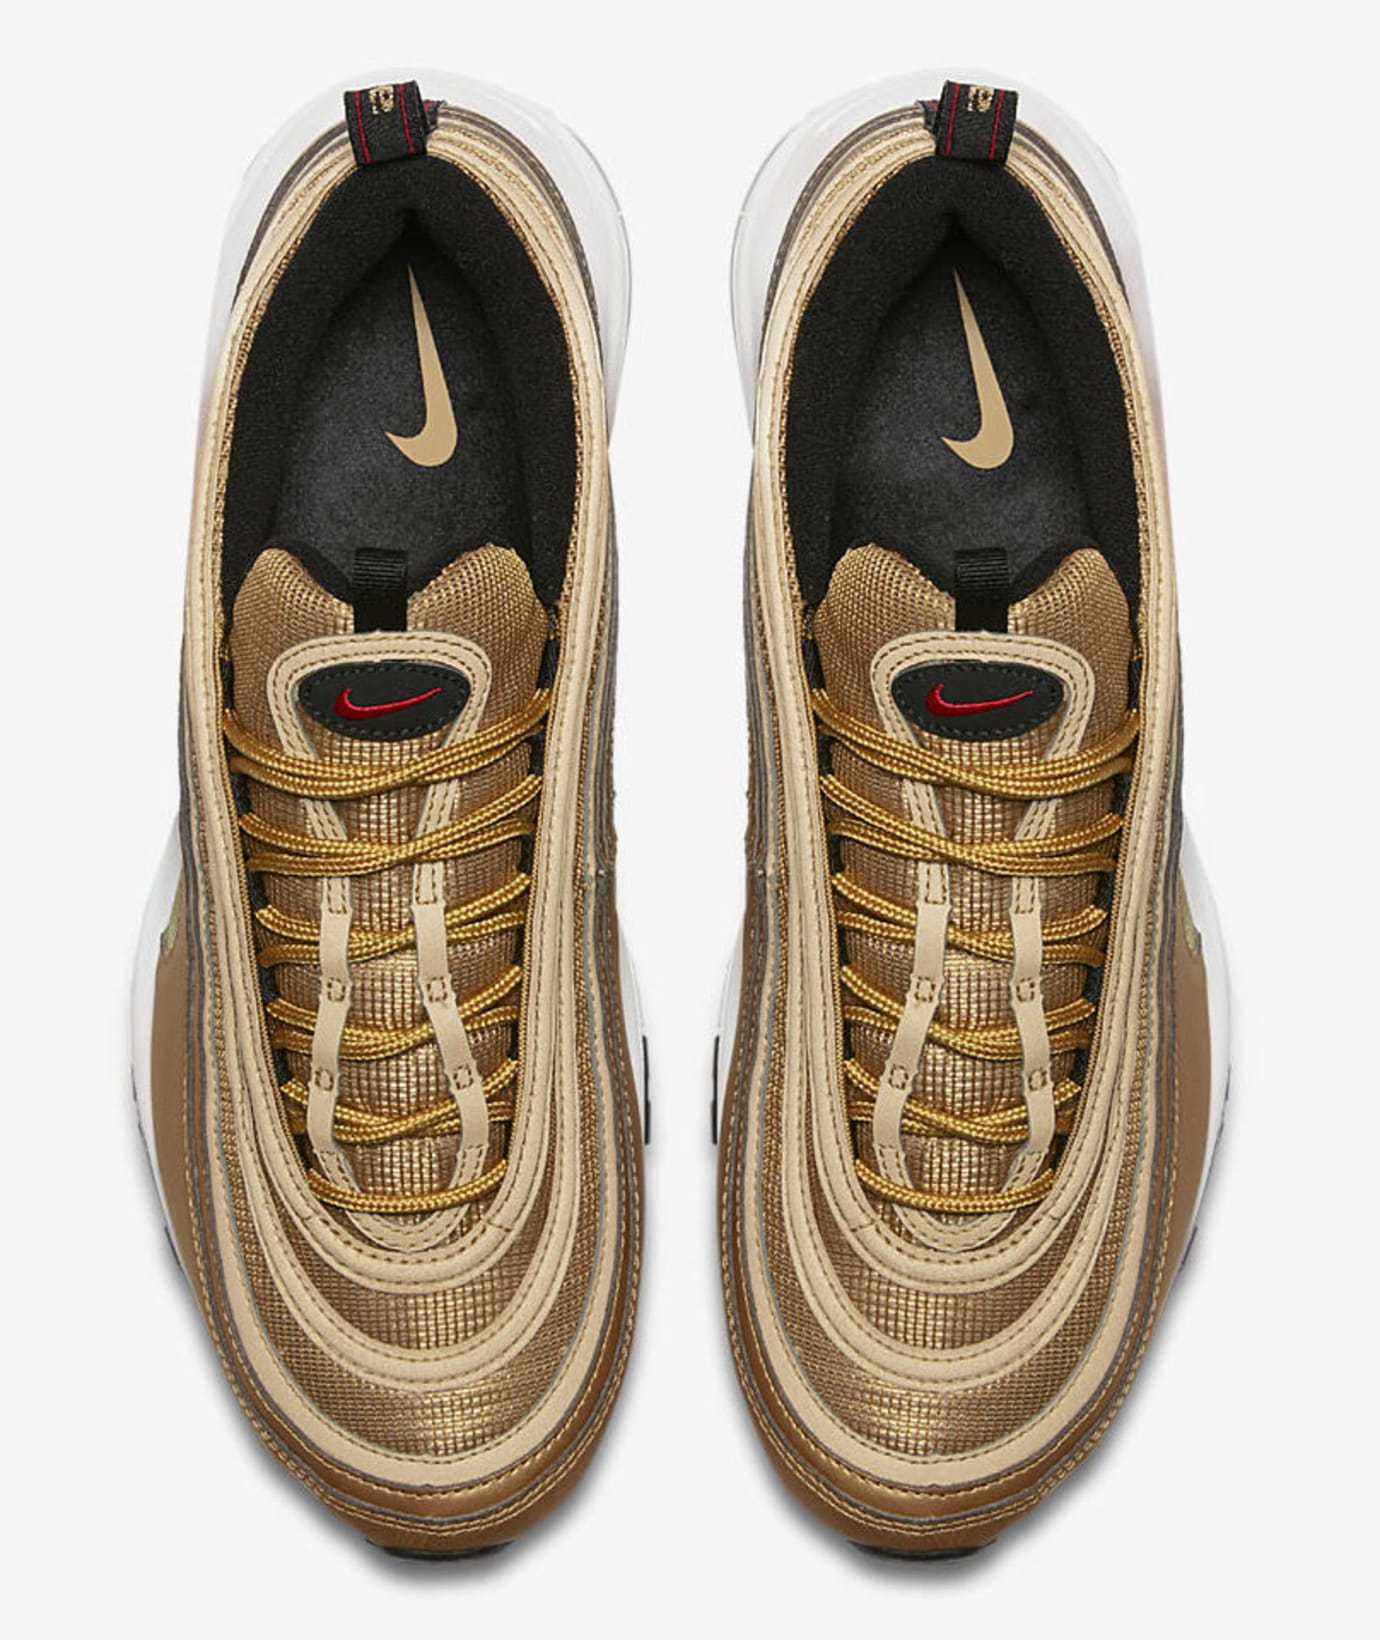 6049a5ba01 Nike Air Max 97 OG 'Metallic Gold' 884421-700 Release Date 2018 ...